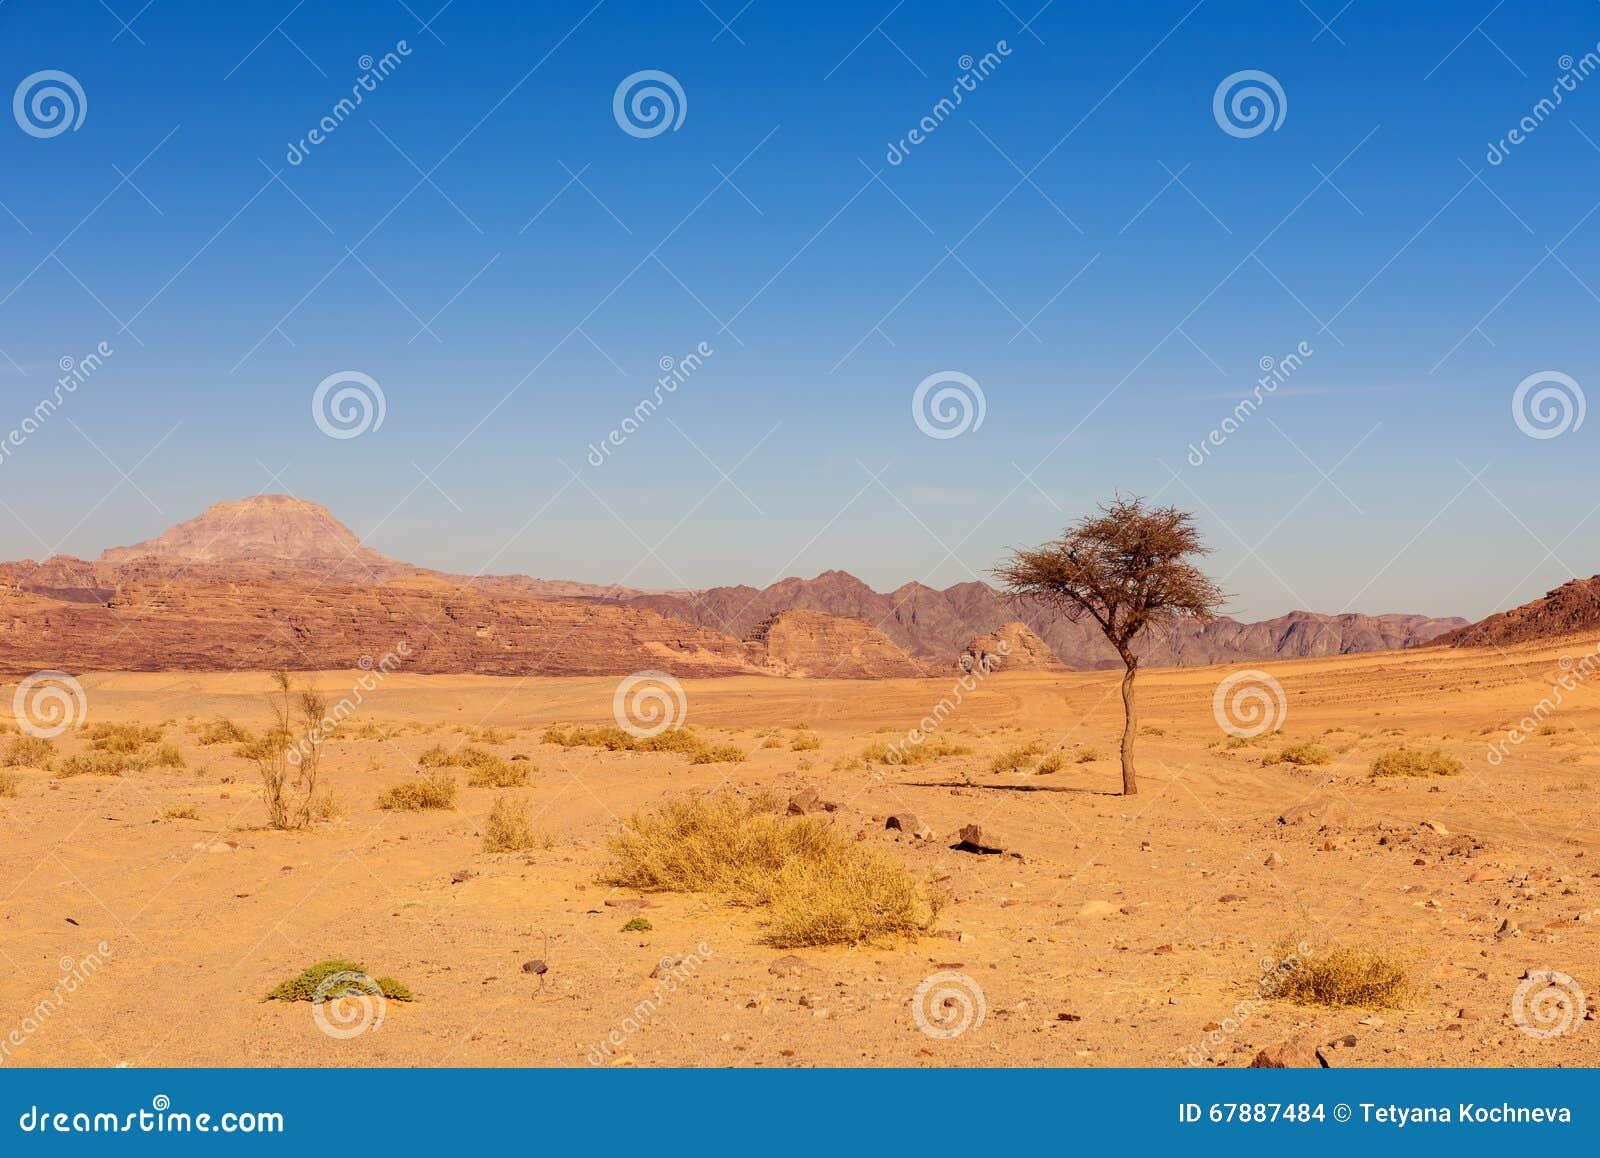 Deserto ed albero asciutti Sinai egitto